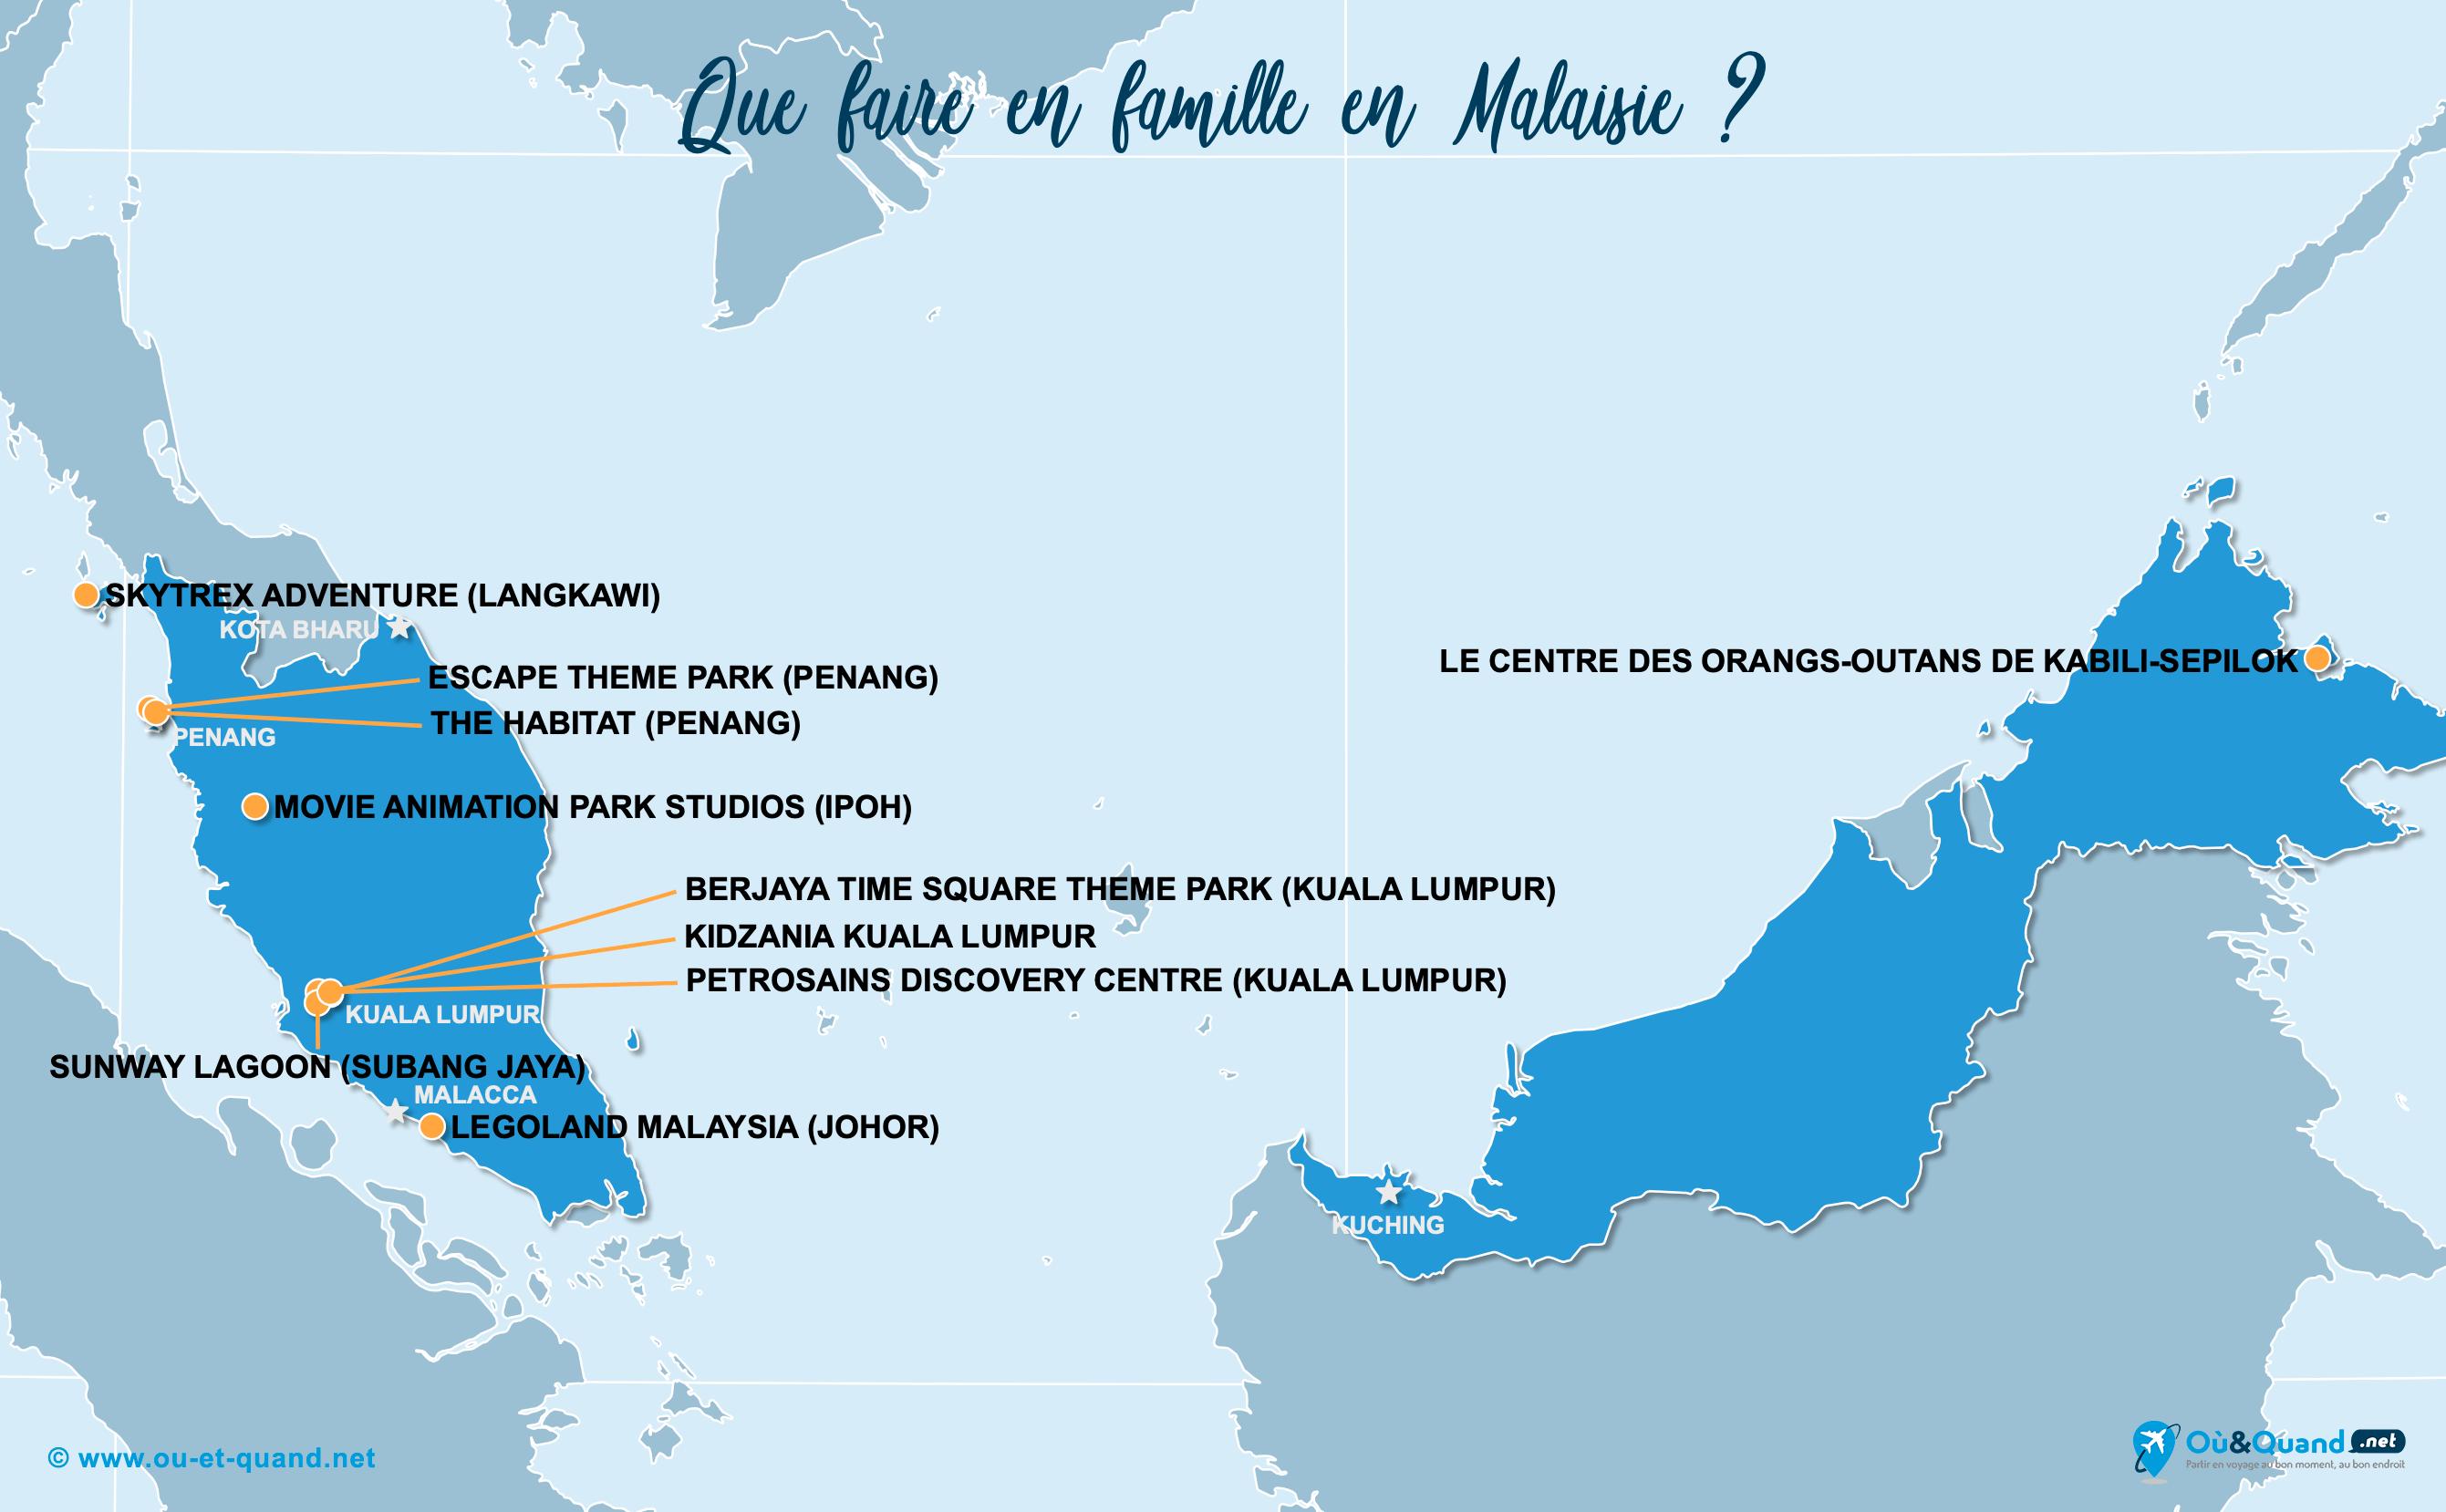 Carte Malaisie : La Malaisie en famille